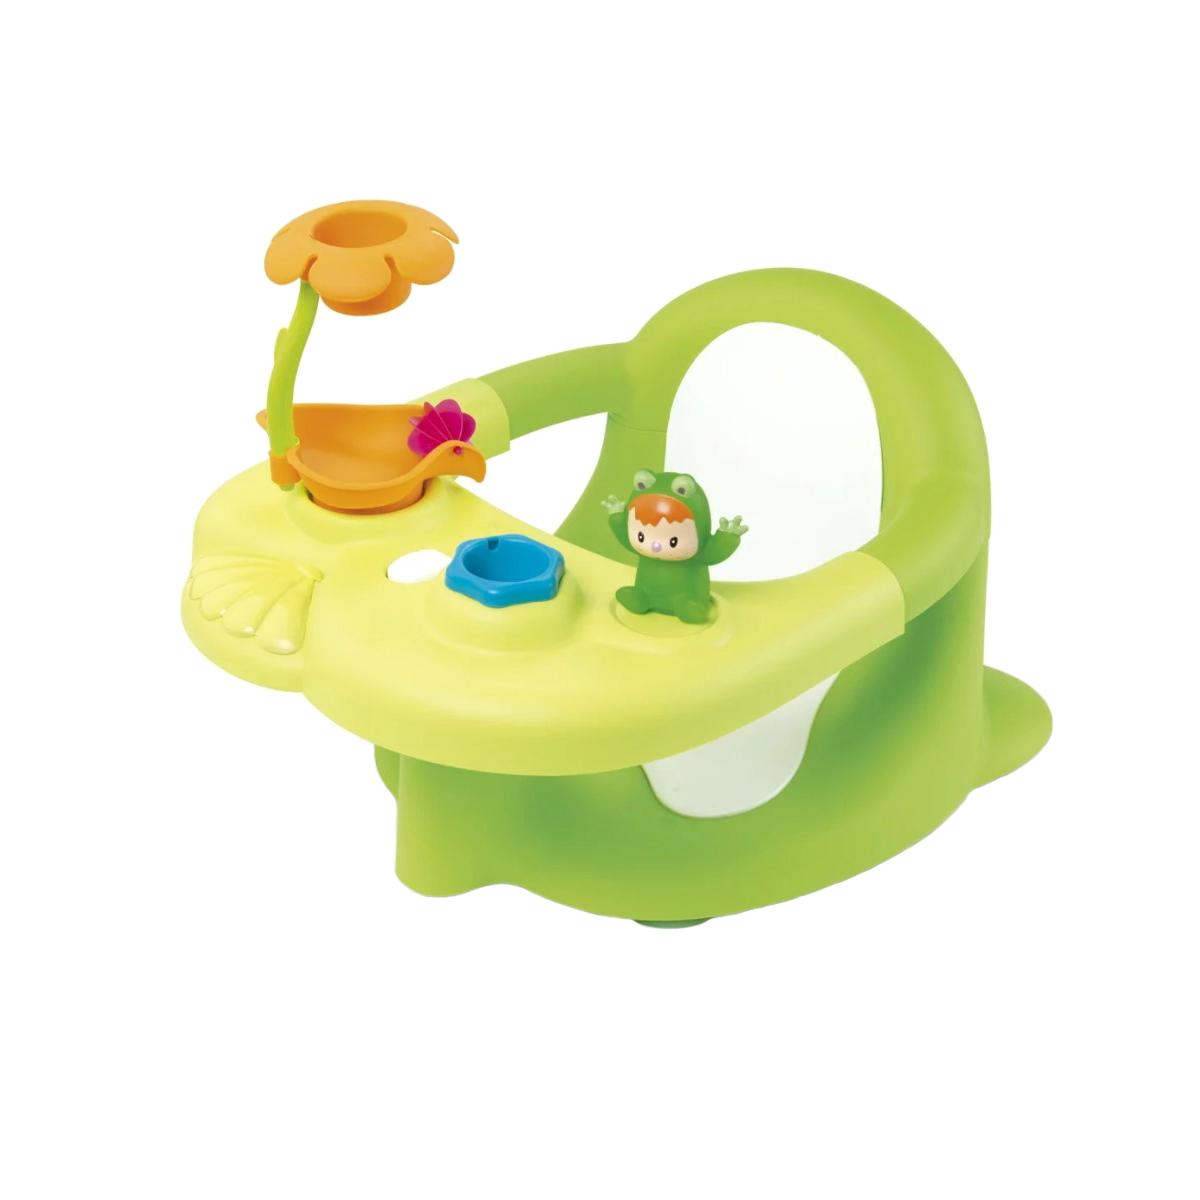 smoby Стул для купания Cotoons, зеленый, Smoby (110615)